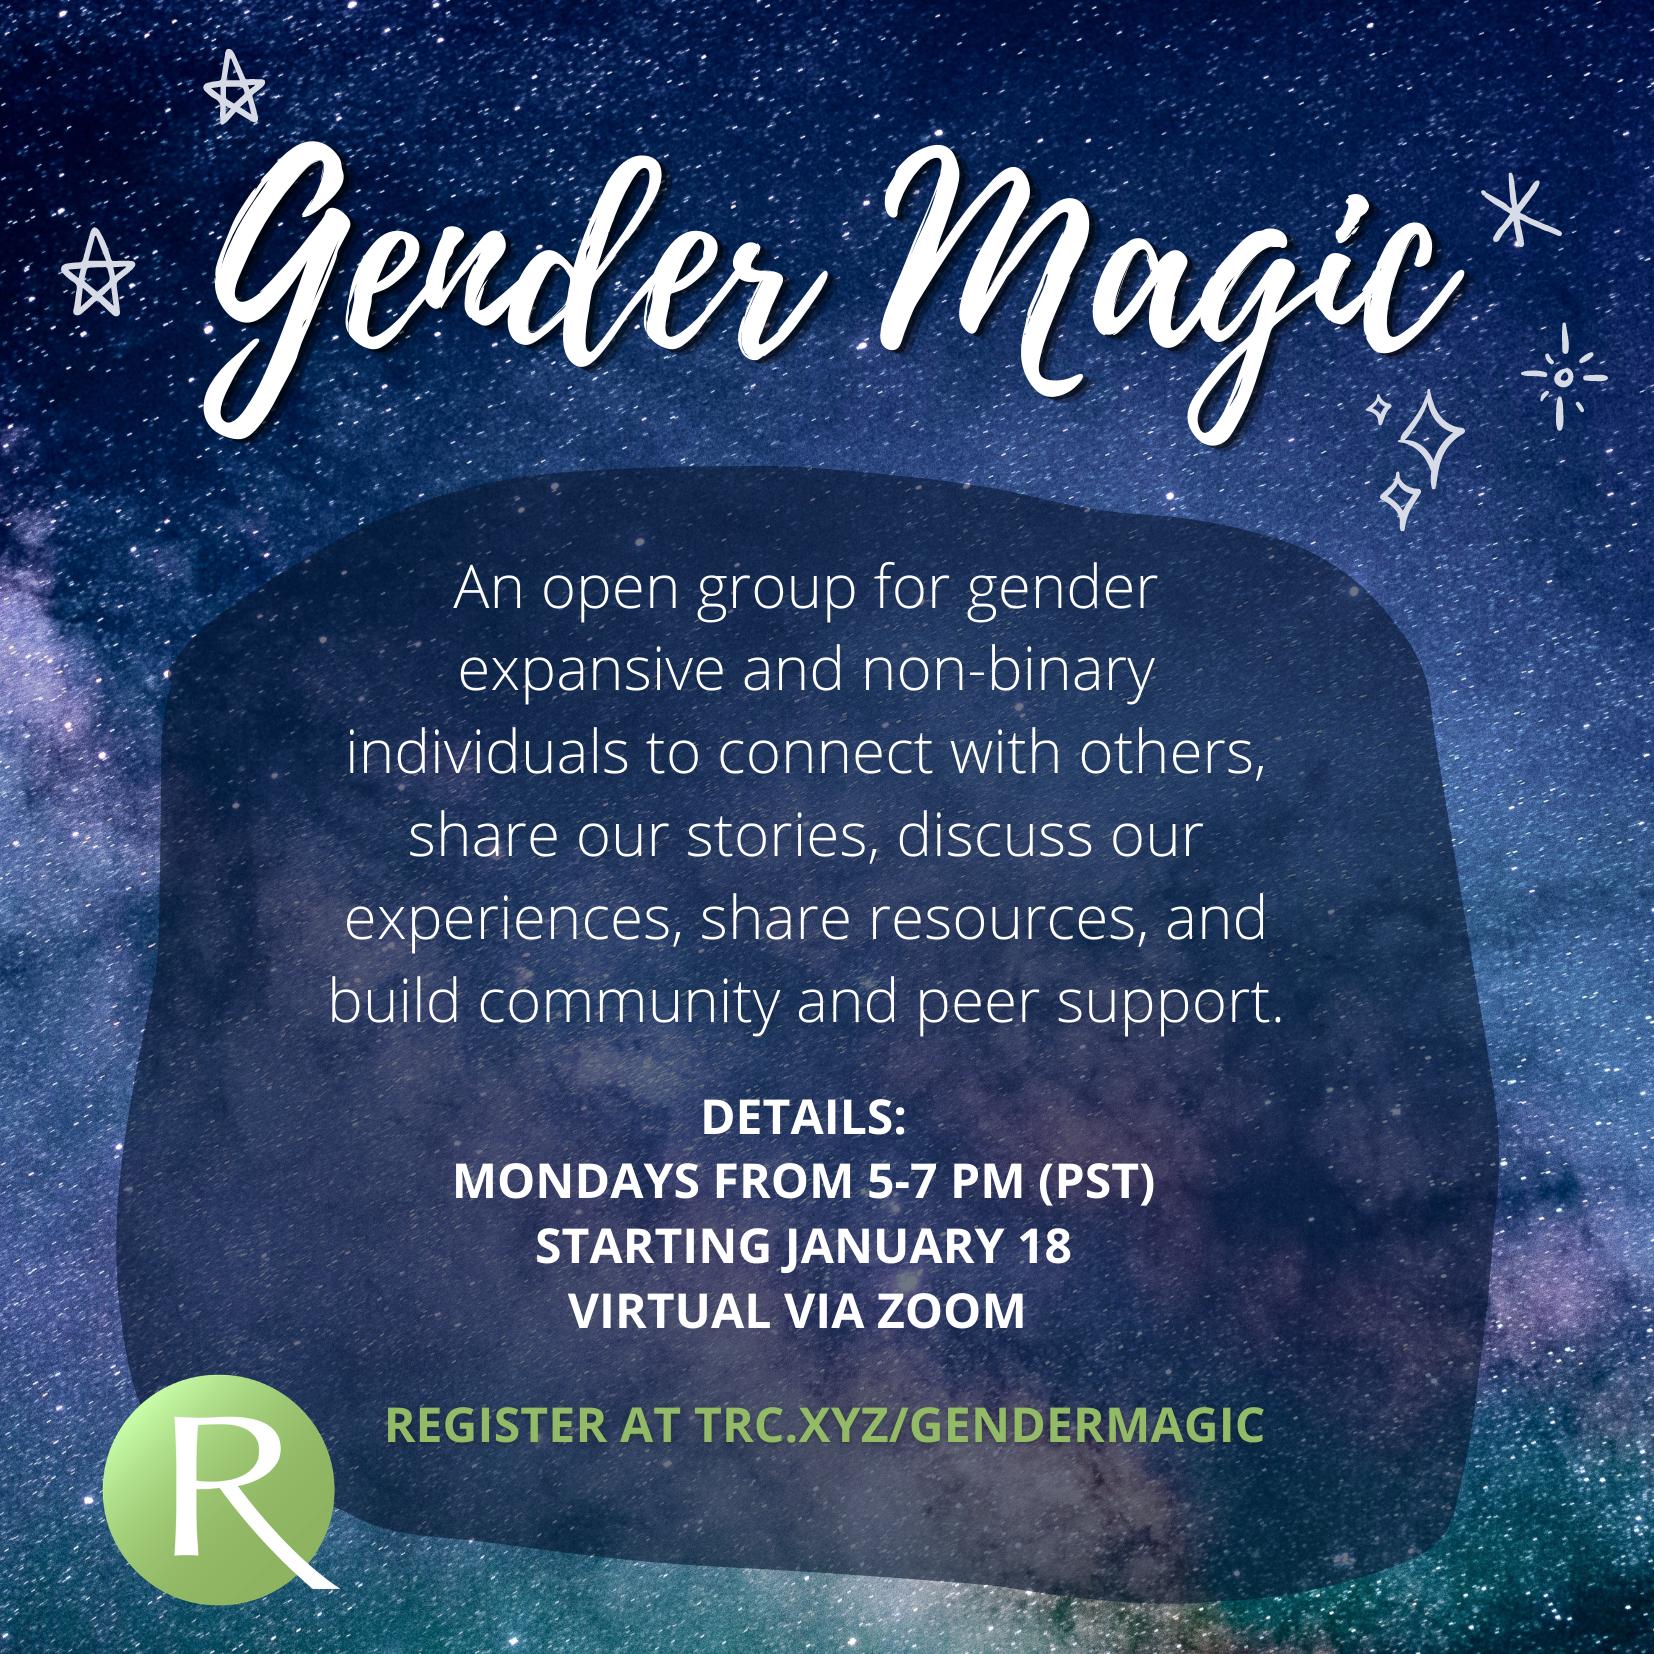 Gender Magic